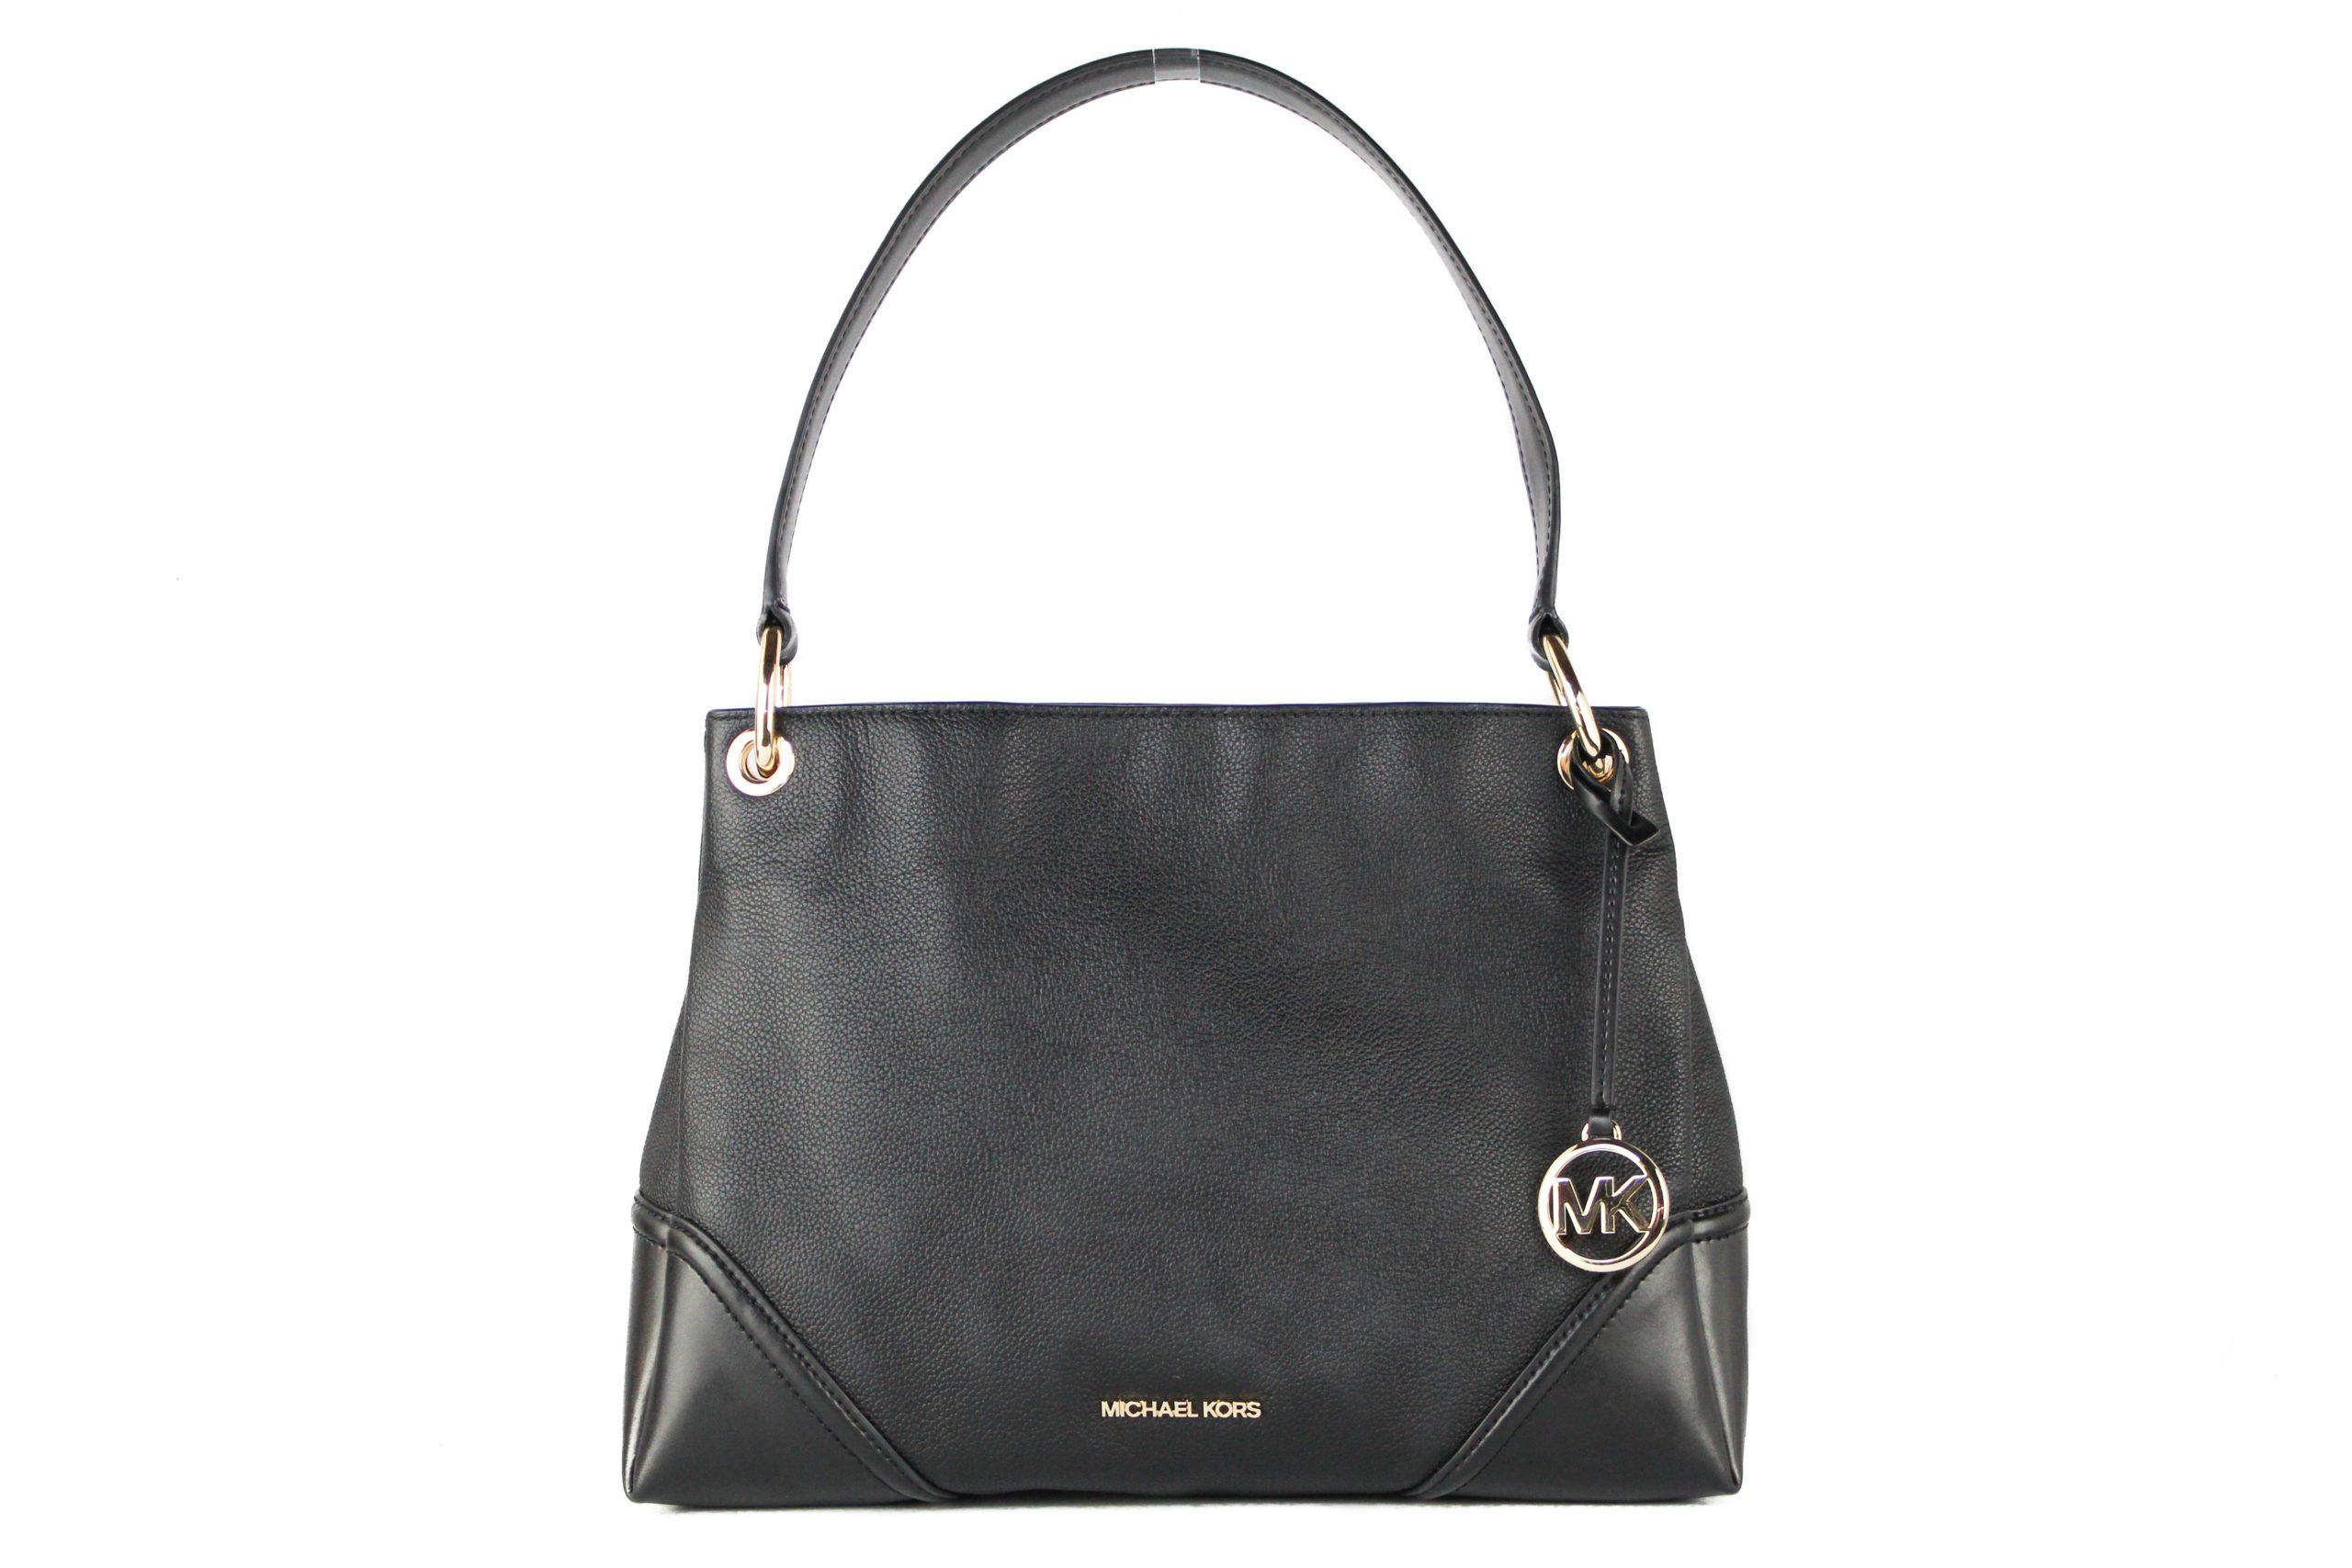 Michael Kors Women's Nicole Shoulder Bag Black 704874